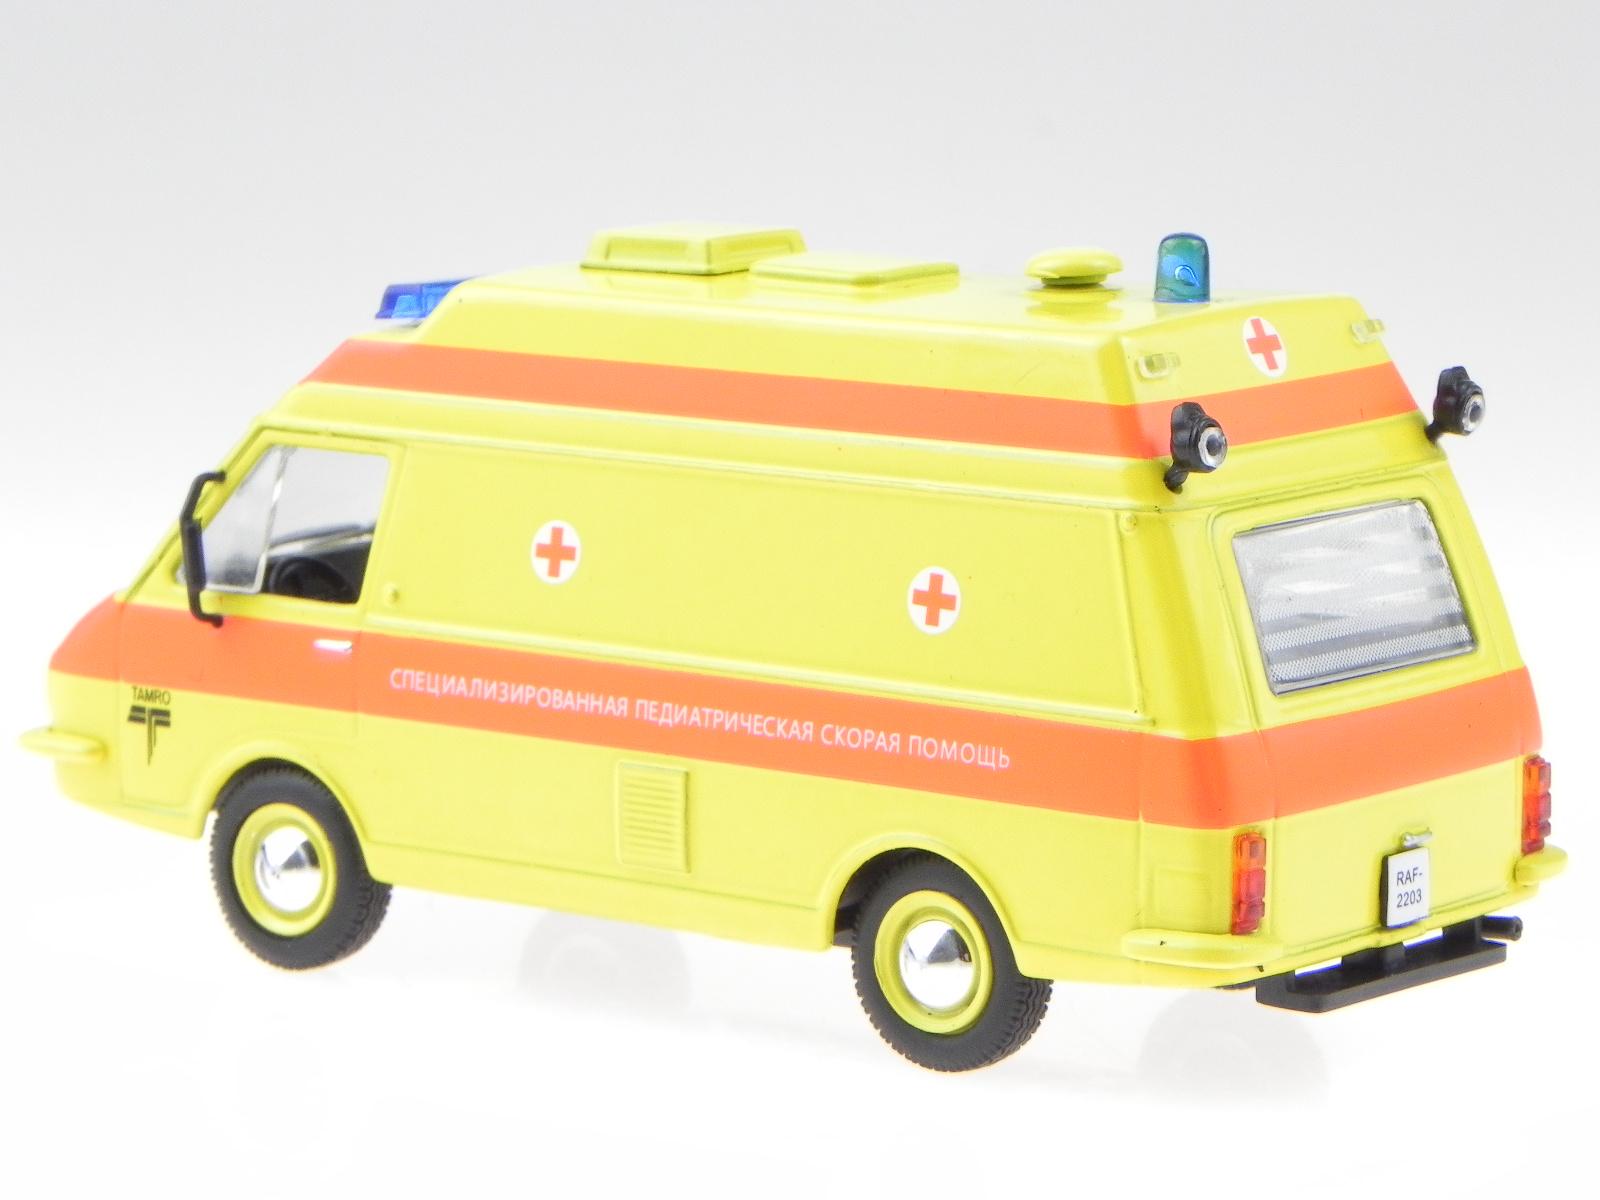 Raf 2203 Latvija Ambulance cuerpo de bomberos coche en miniatura 7495011 Atlas 1